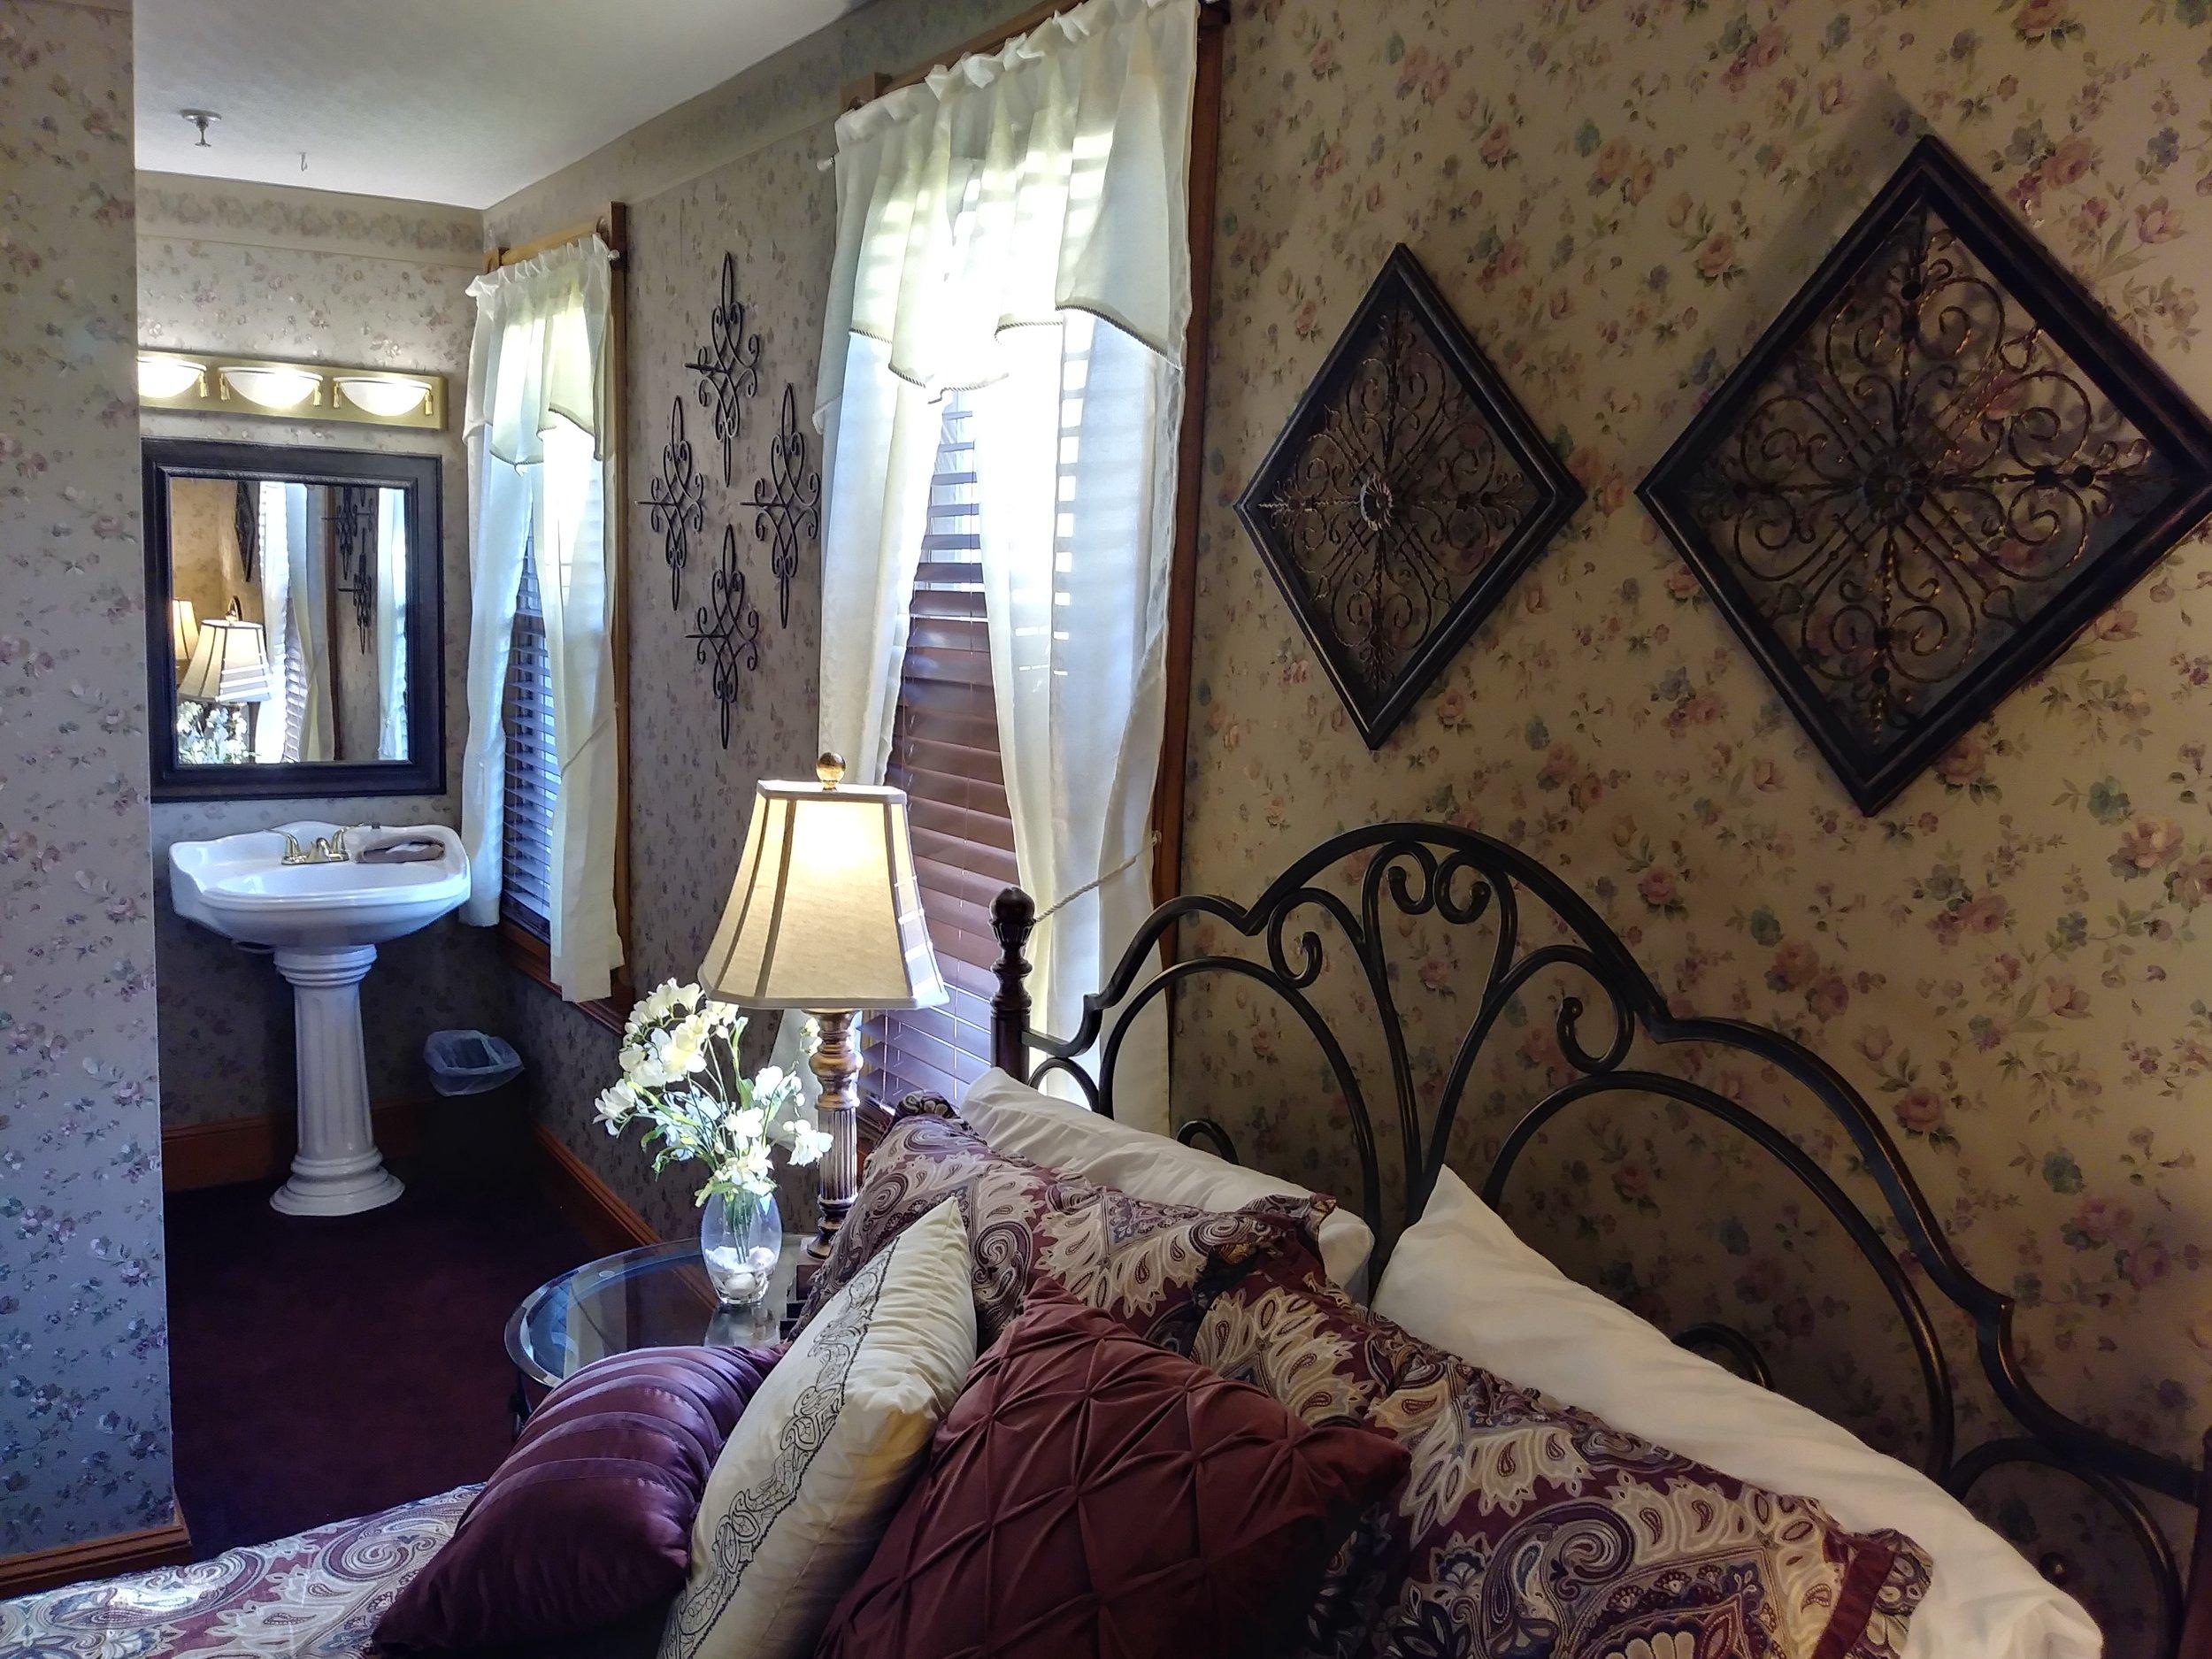 Room 306 11.jpg